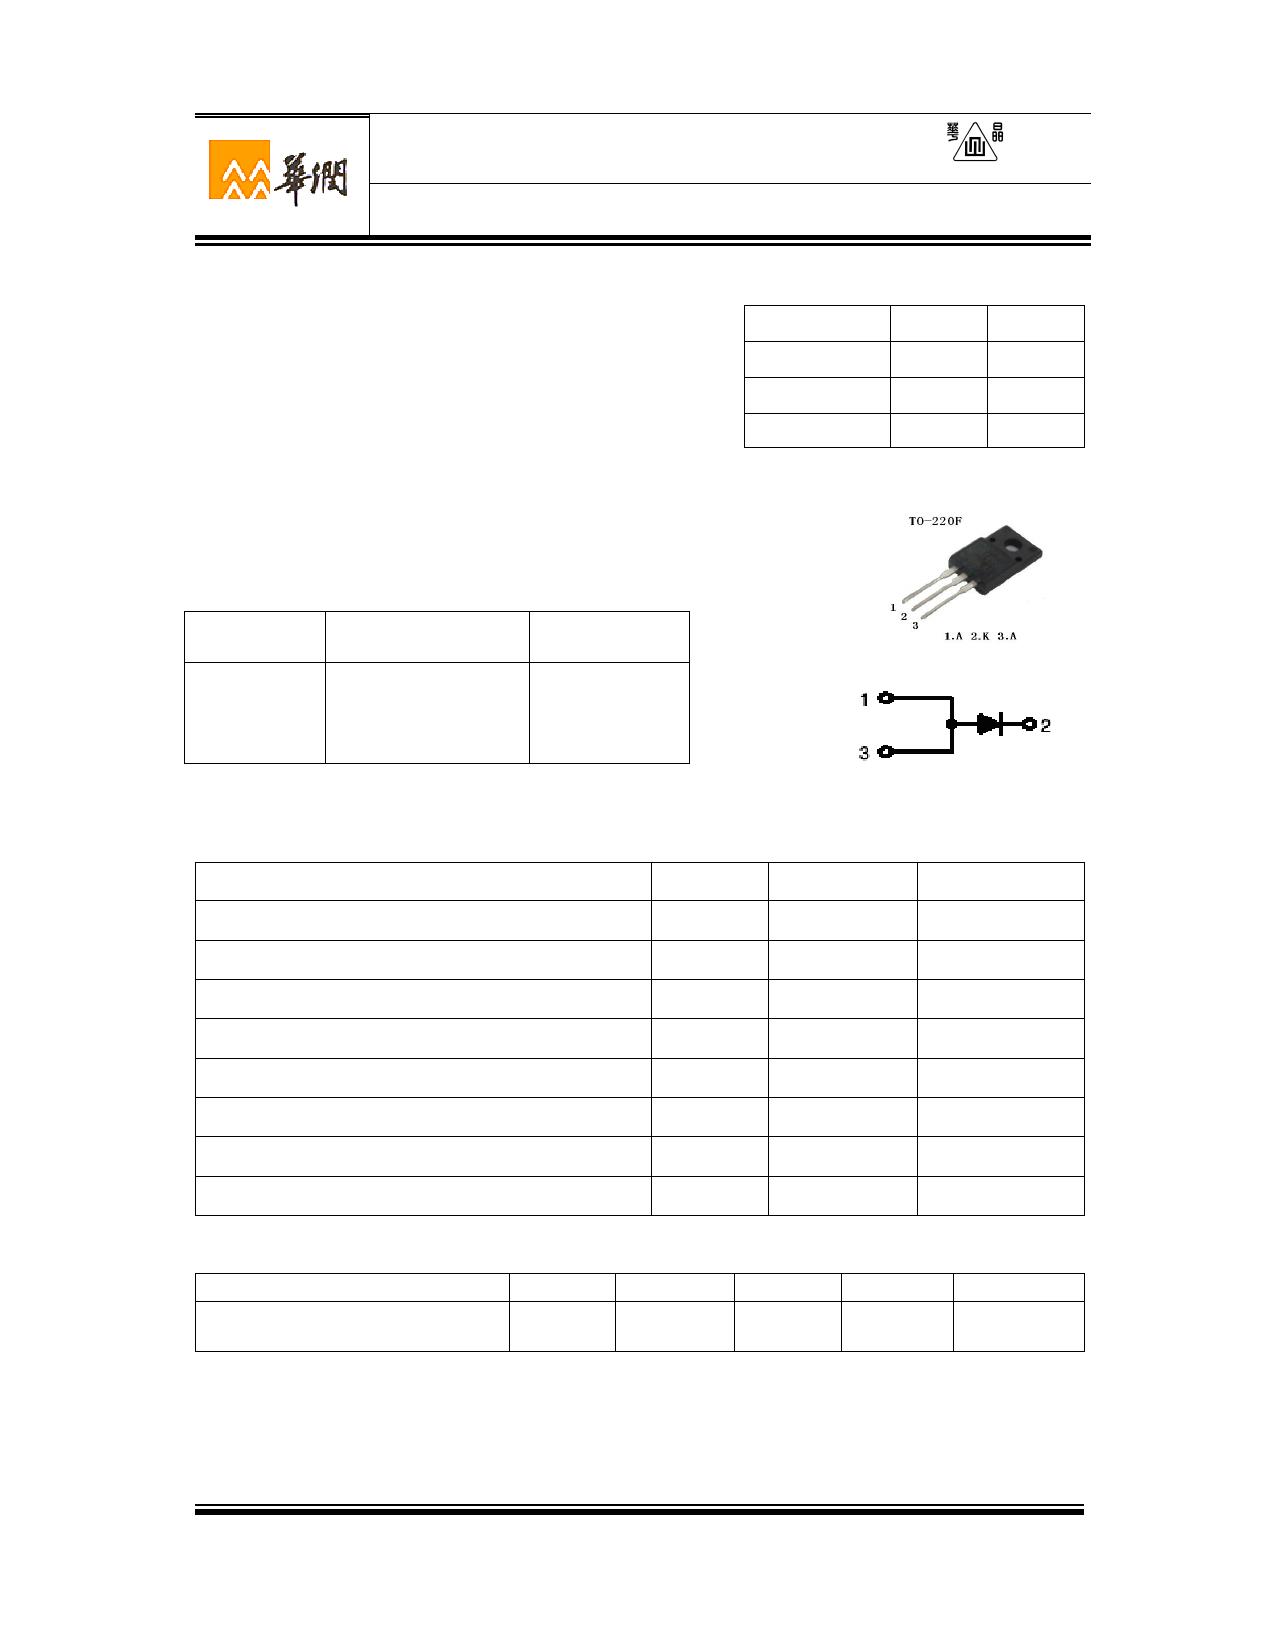 2CZ10100A9 Datasheet, 2CZ10100A9 PDF,ピン配置, 機能